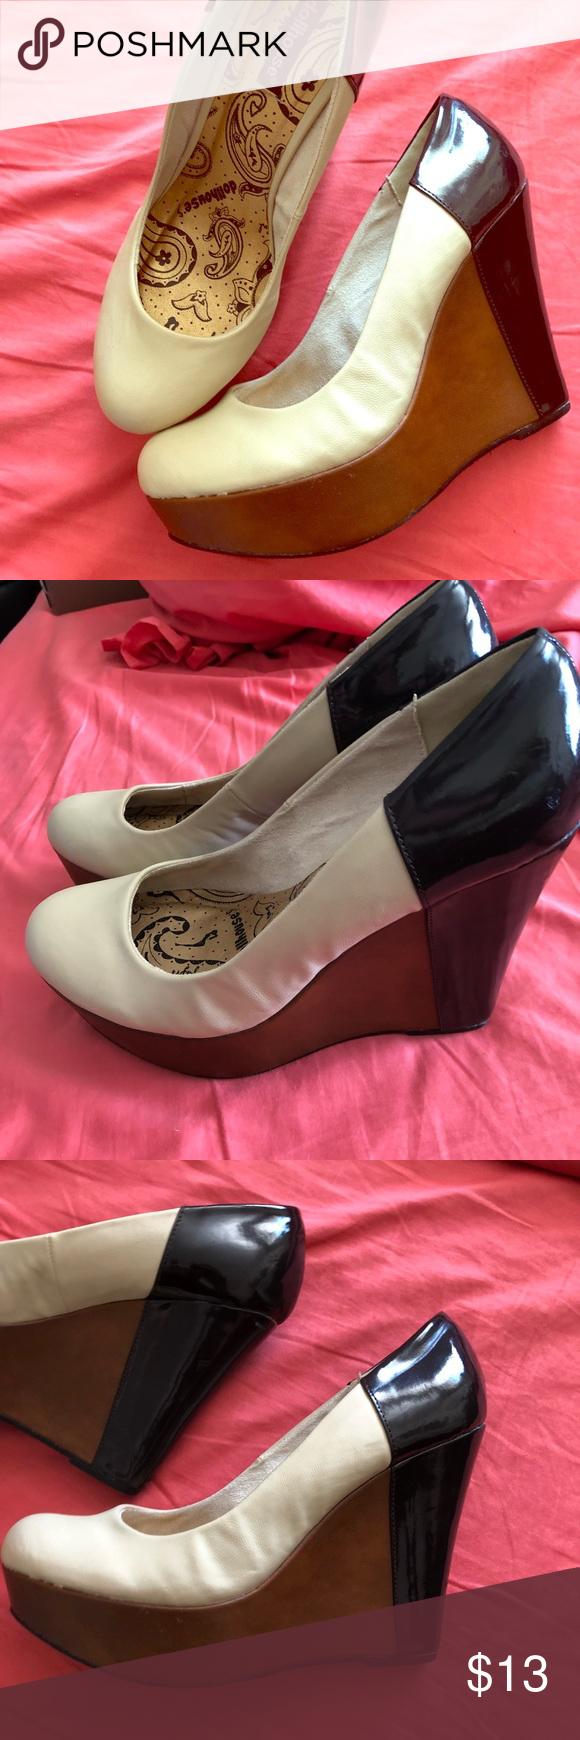 ce866b86569 Dollhouse Wedge Heels EUC. Tricolor wedge heels. Black patent